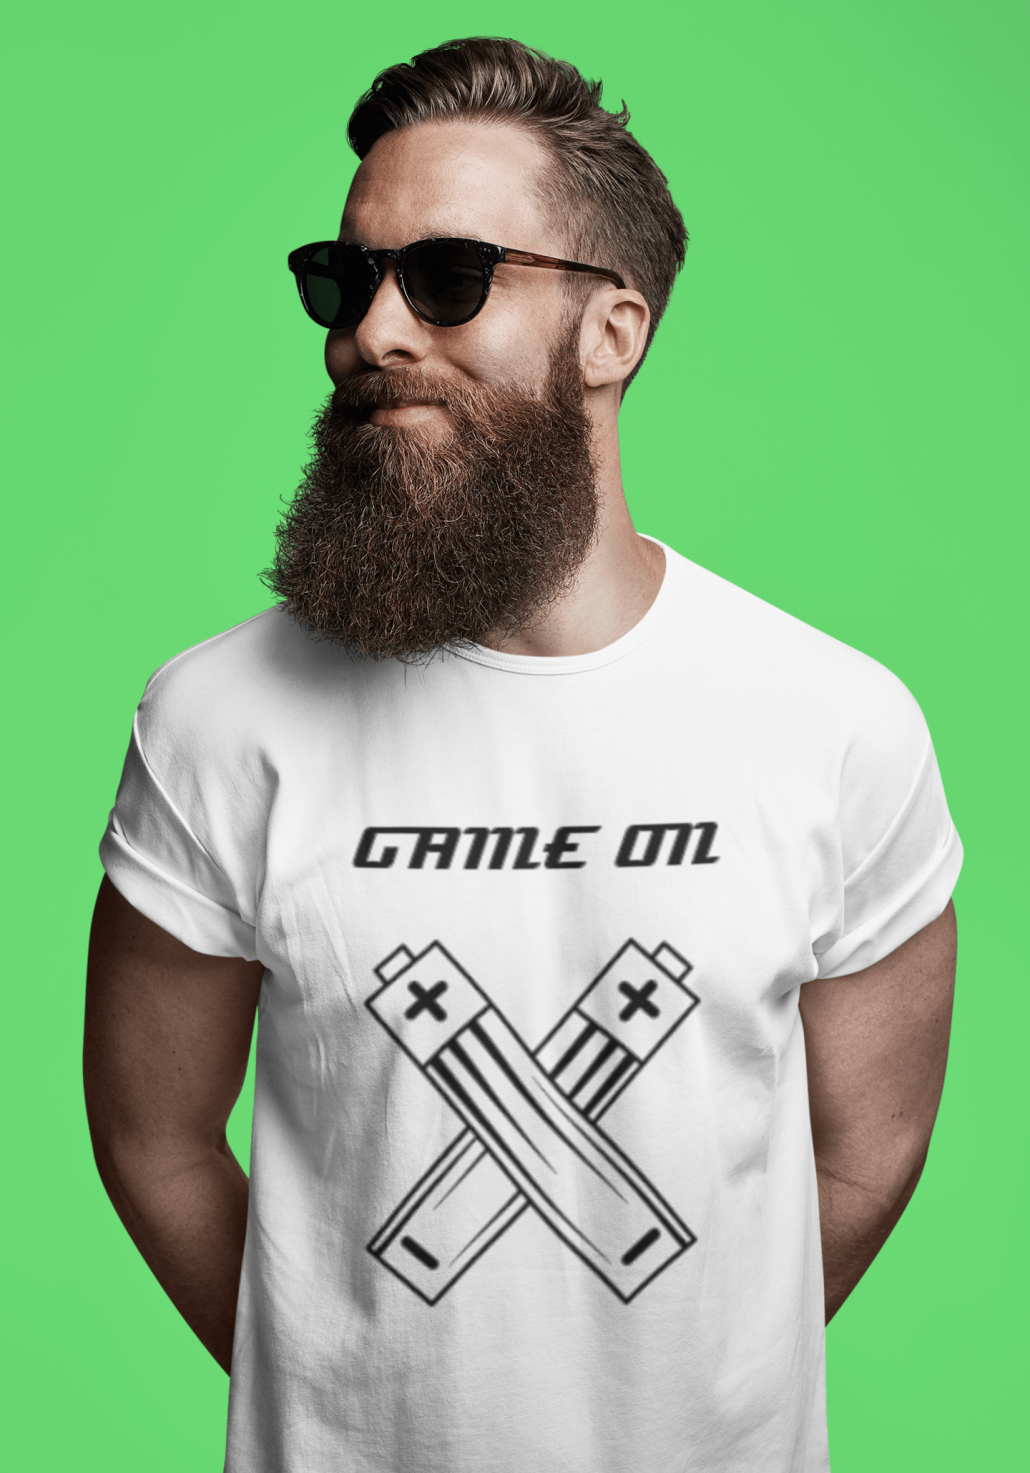 Bearded guy with custom gaming T-shirt